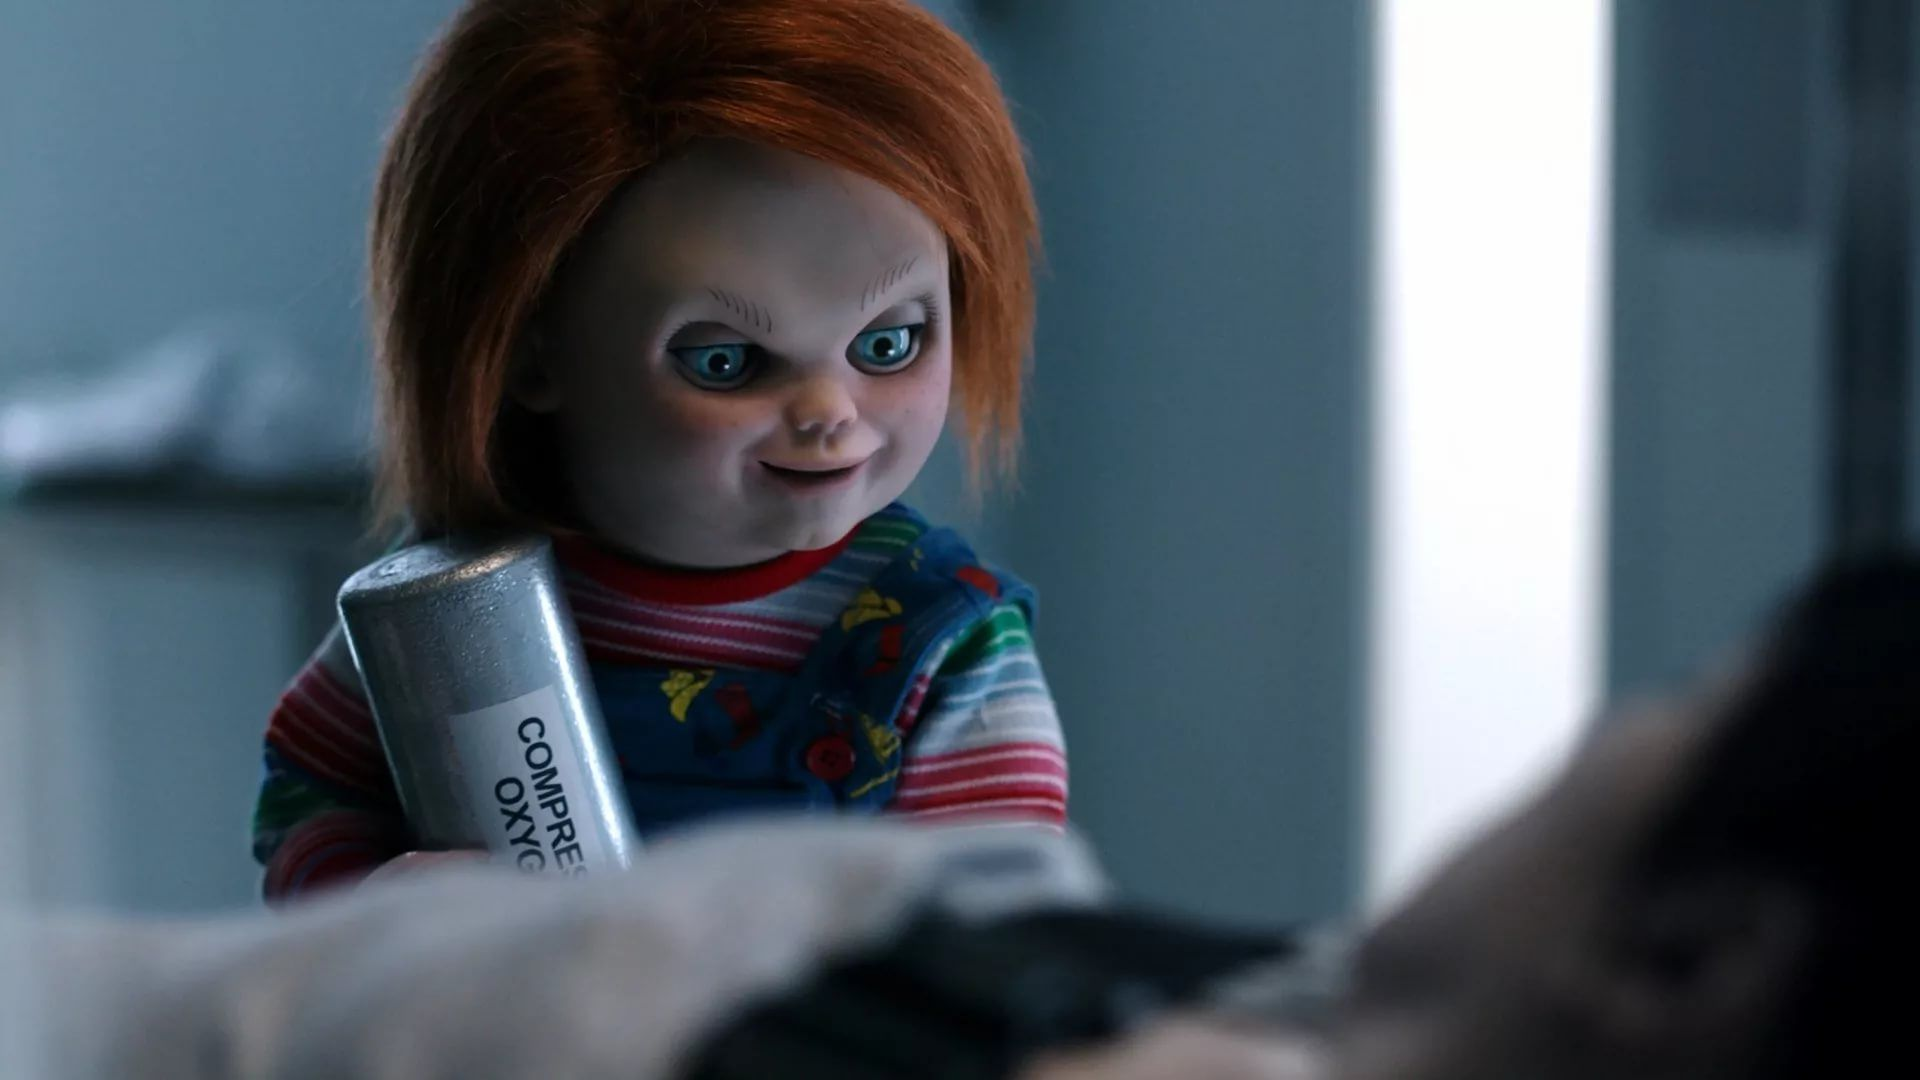 Chucky Doll hd wallpaper 1080